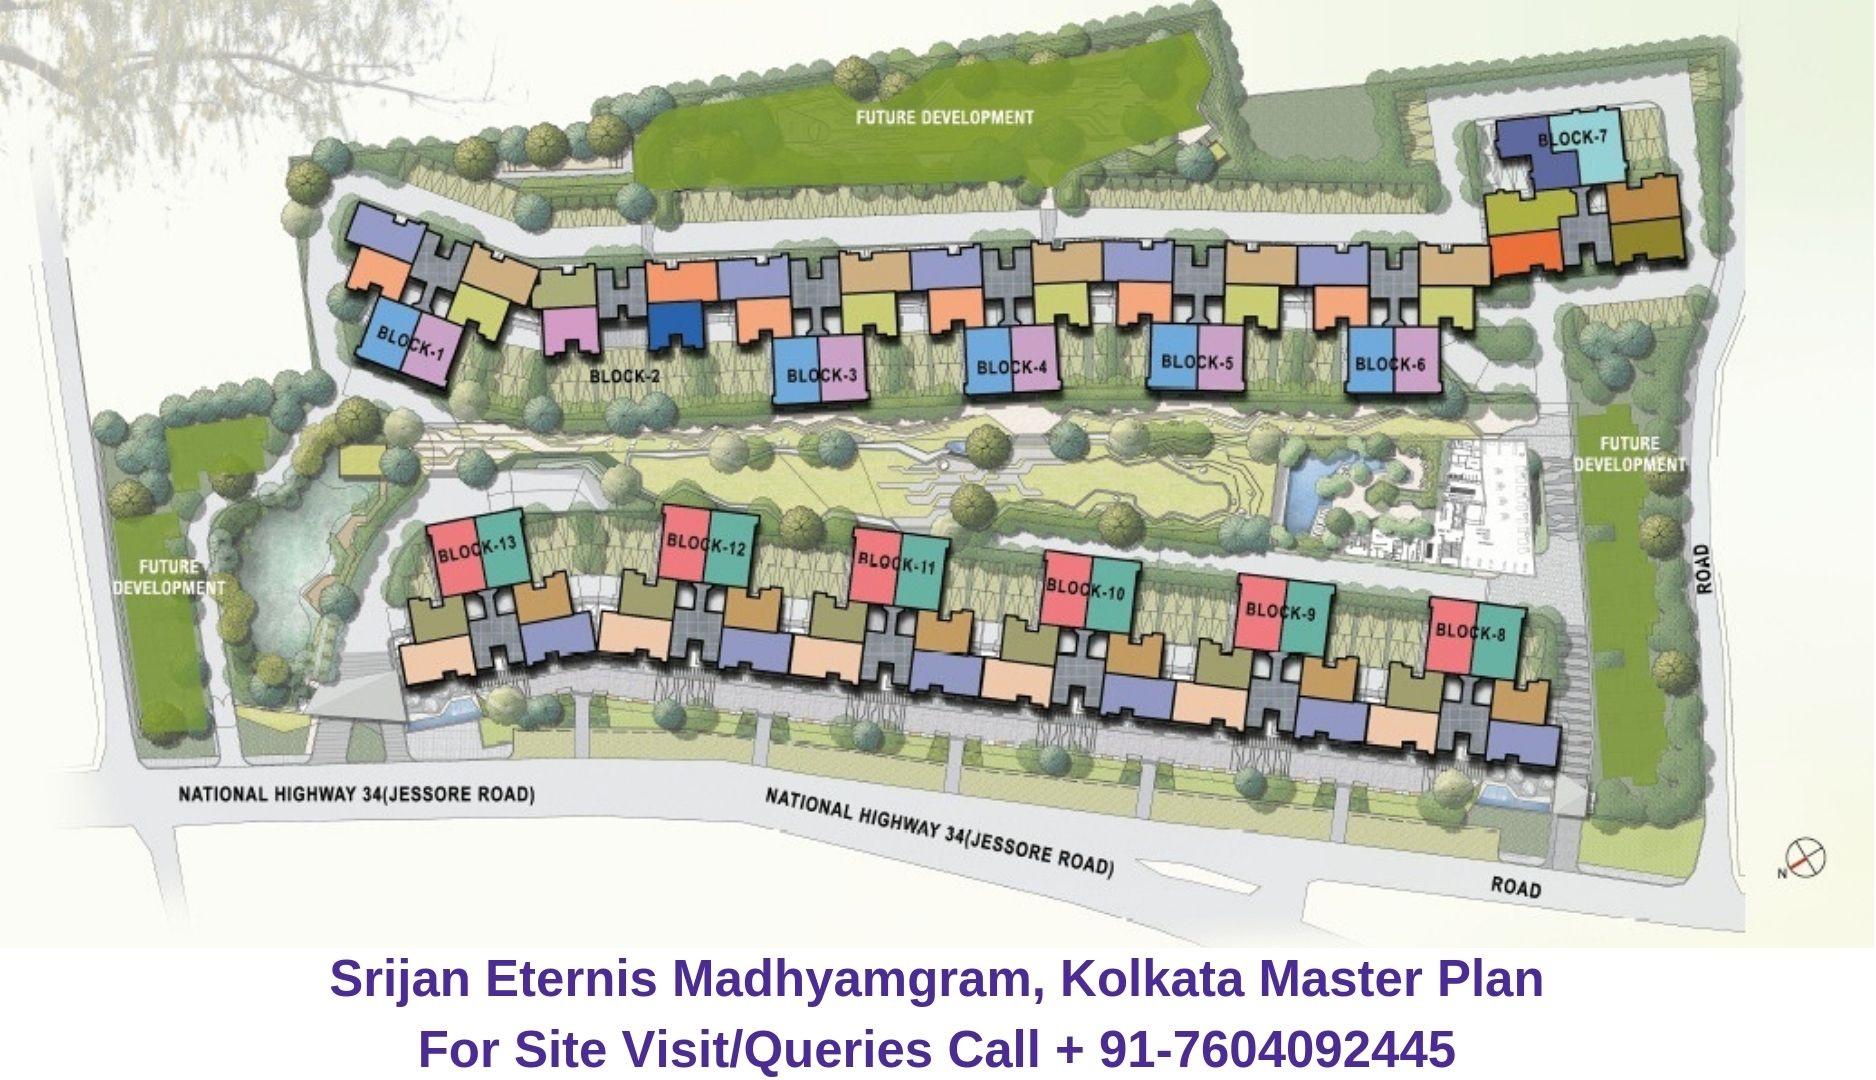 Srijan Eternis Madhyamgram, Kolkata Master Plan